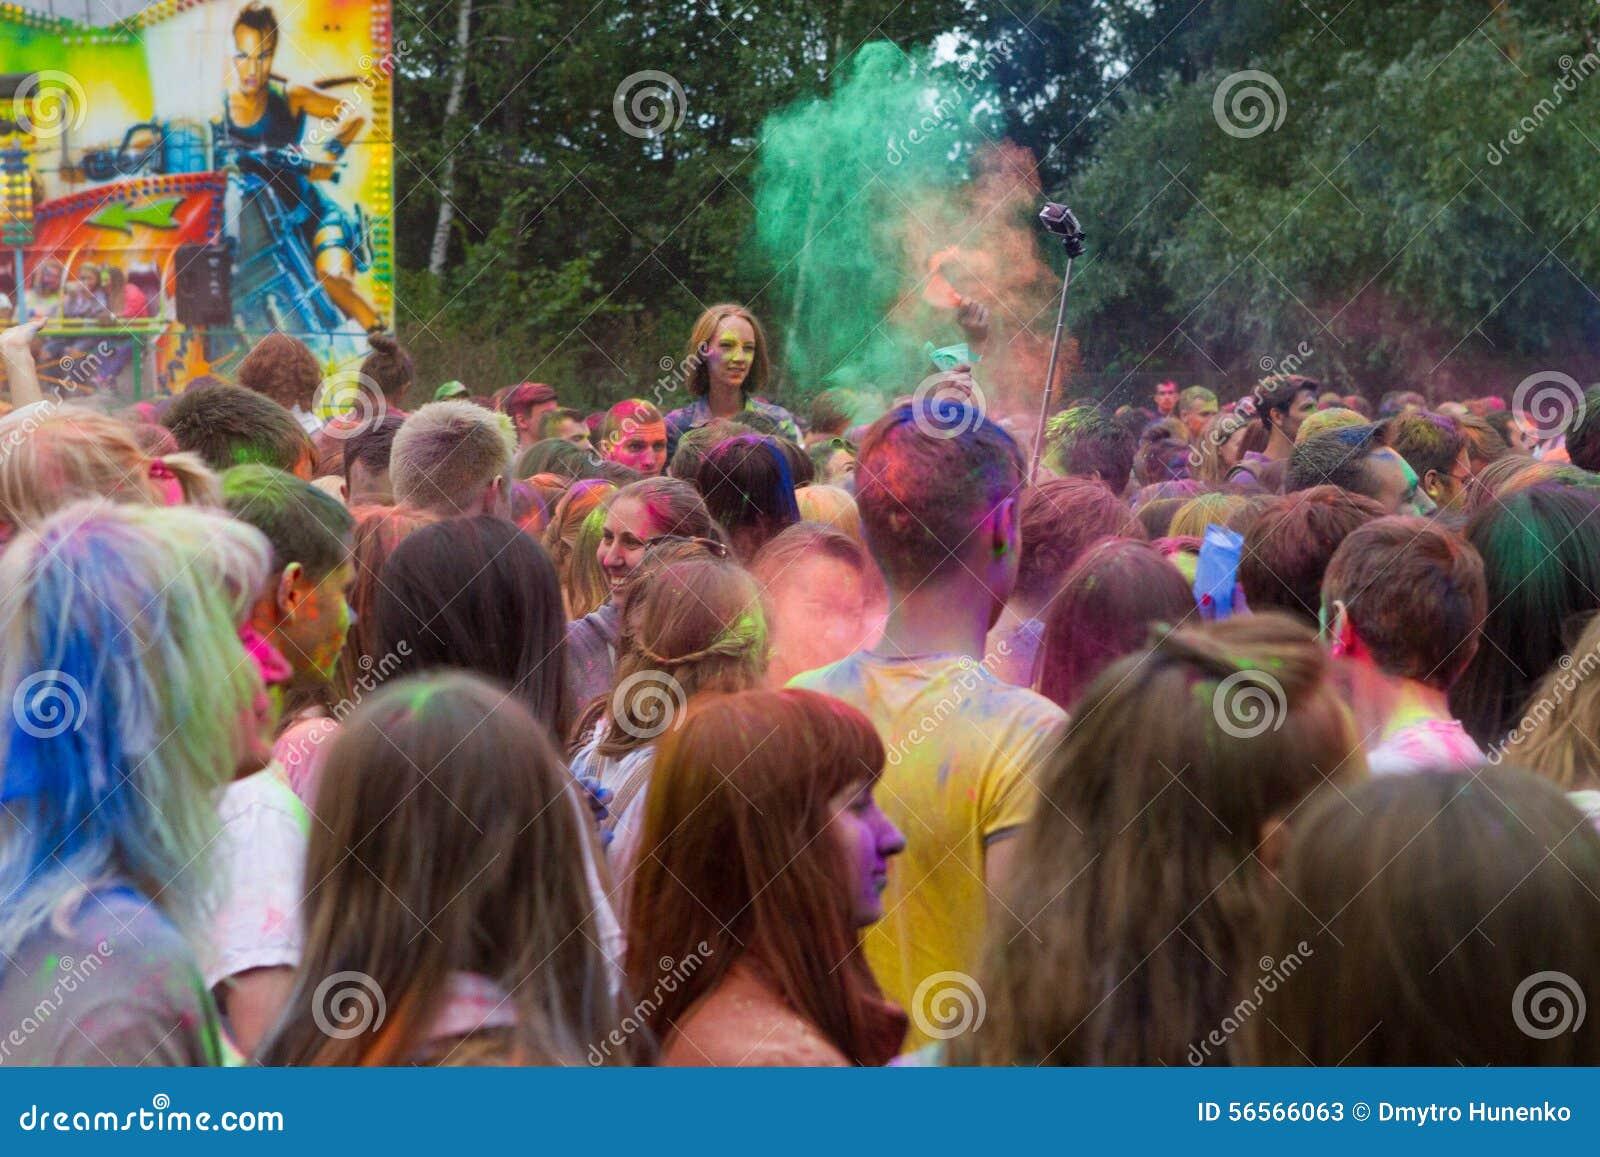 Download Ινδικό φεστιβάλ των χρωμάτων Εκδοτική Στοκ Εικόνες - εικόνα από δραστηριοτήτων, χέρι: 56566063